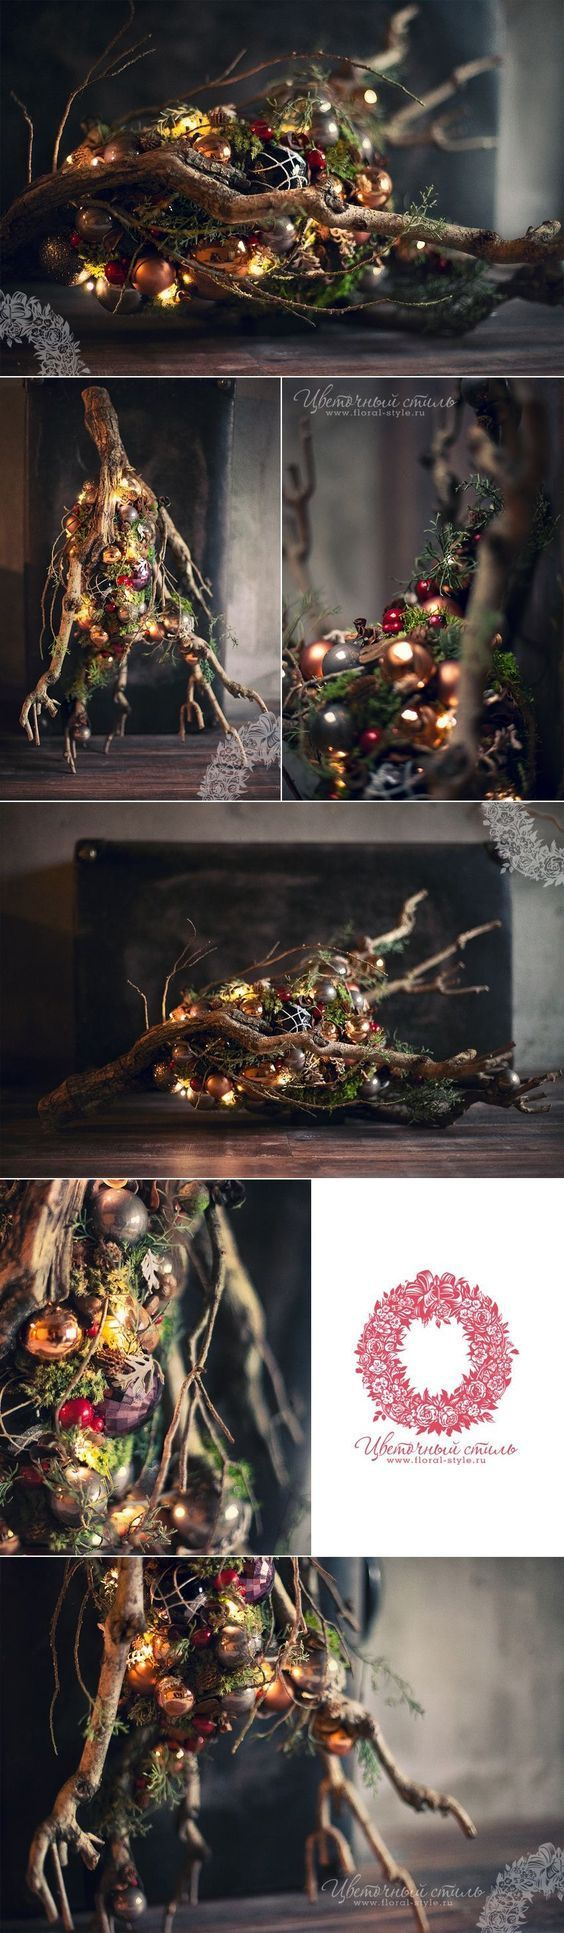 Pin Van Suzanne Bulmer Op Your Pinterest Likes Kerstmis Kerst Ornament Kerstdecoratie